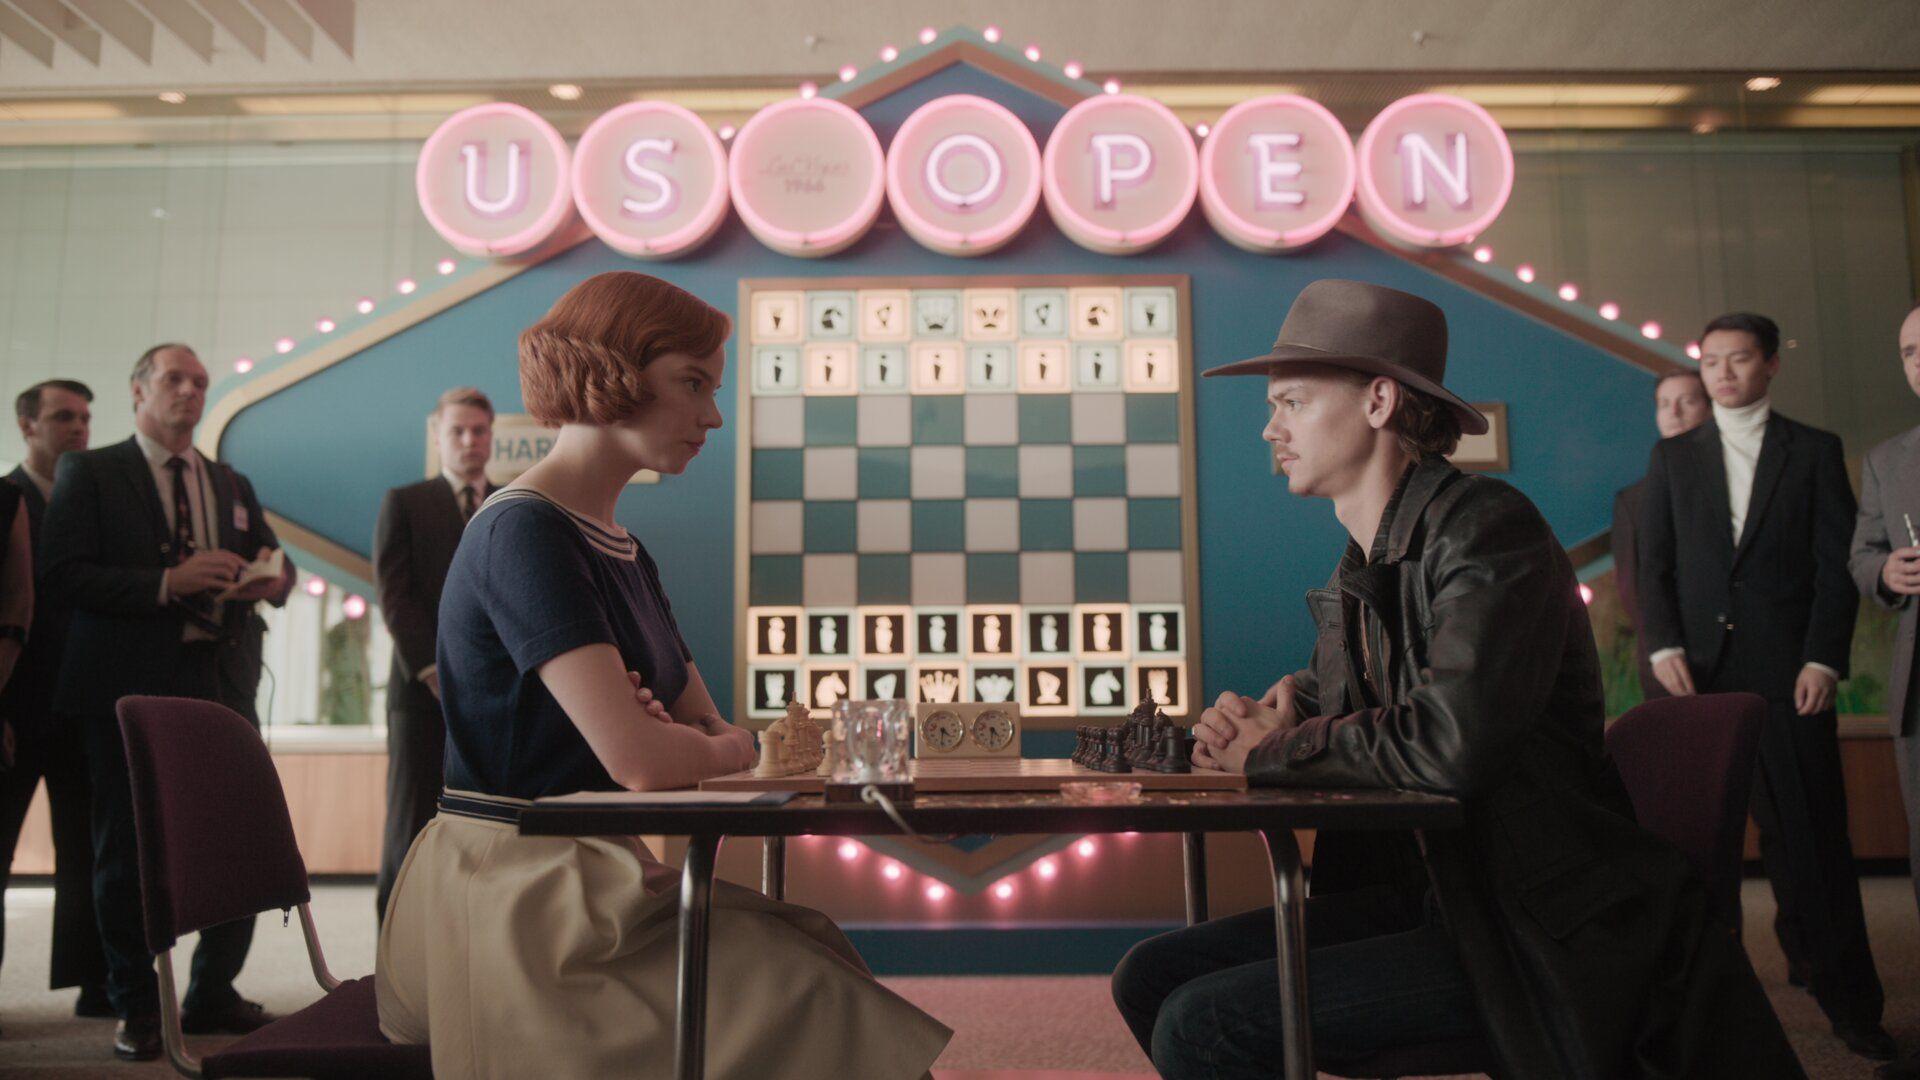 Ход королевы — s01e03 — Doubled Pawns